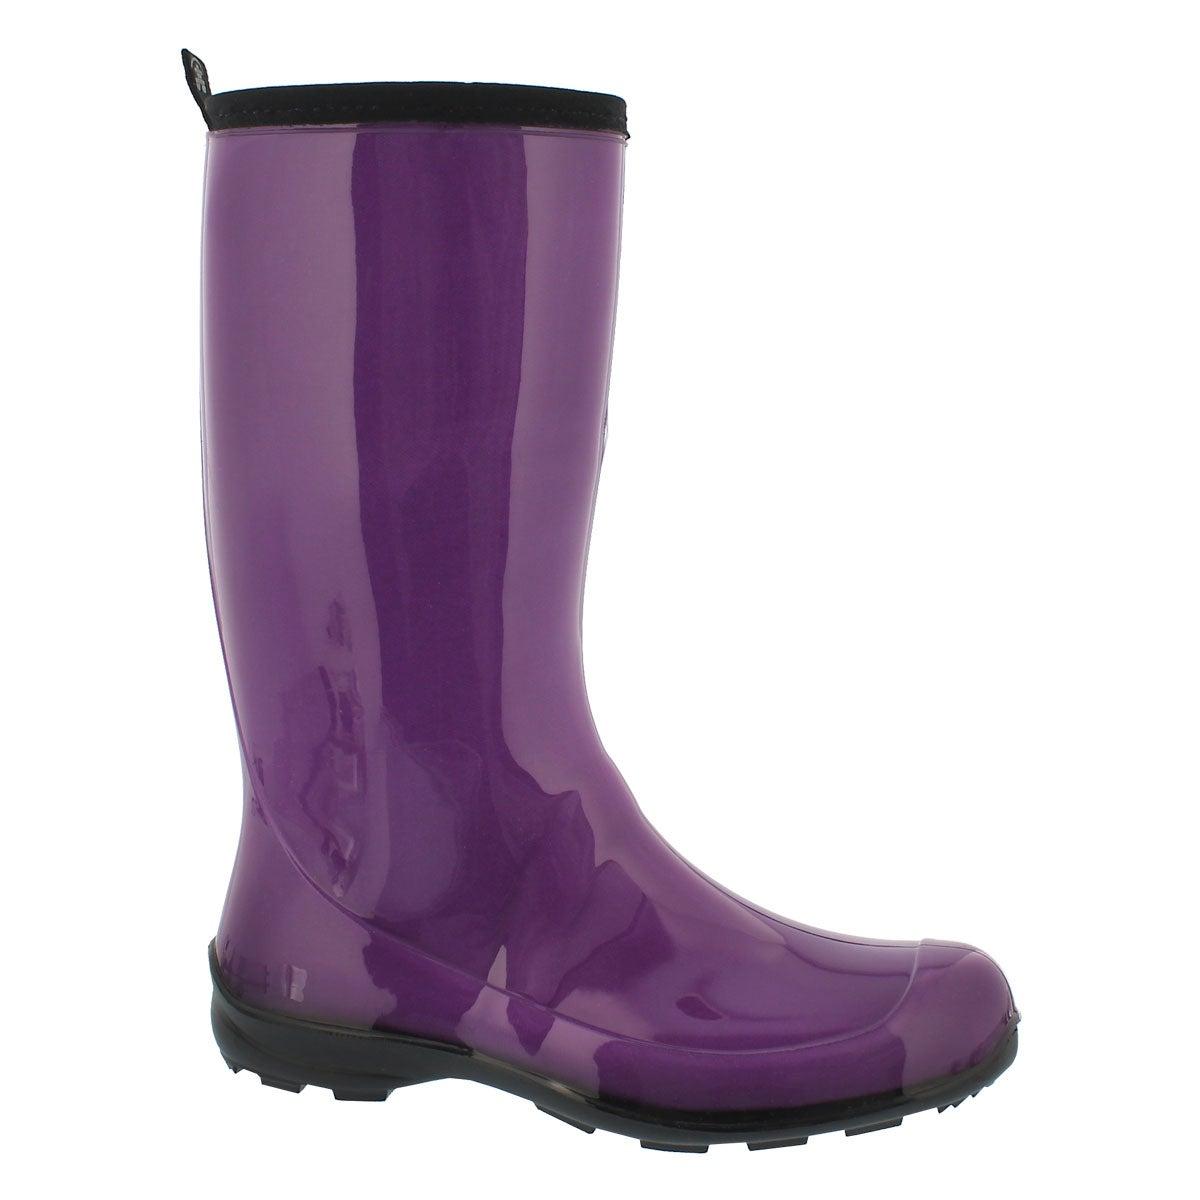 Women's HEIDI dewberry mid waterproof rain boots